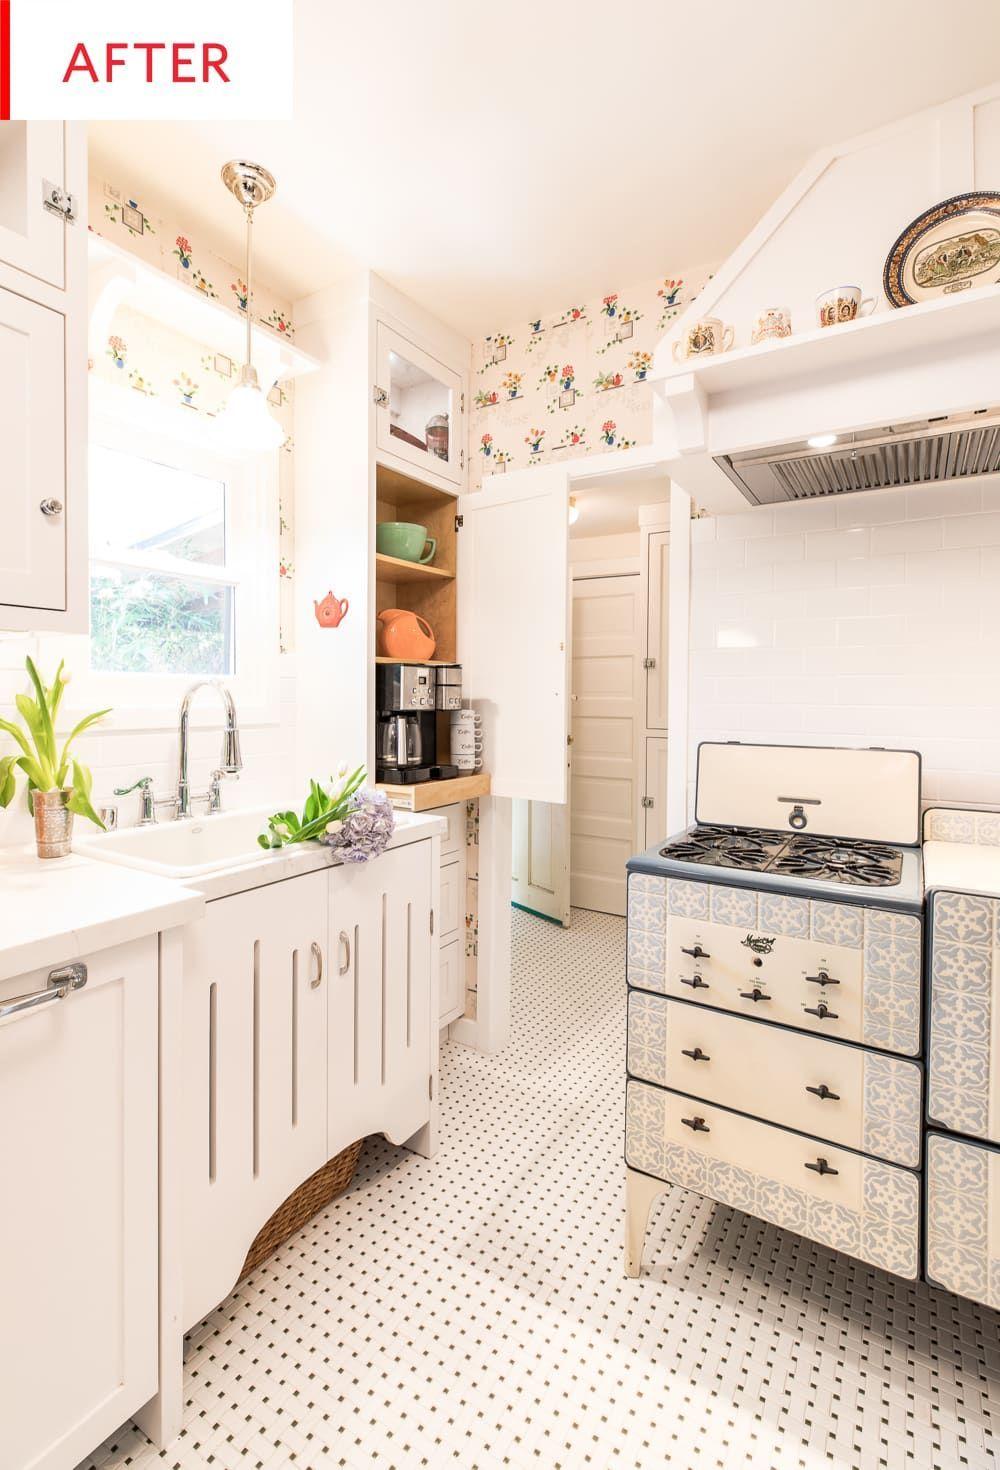 vintage kitchen remodel 1930s and 1940s decor apartment therapy in 2020 1940s decor retro on kitchen interior classic id=18592